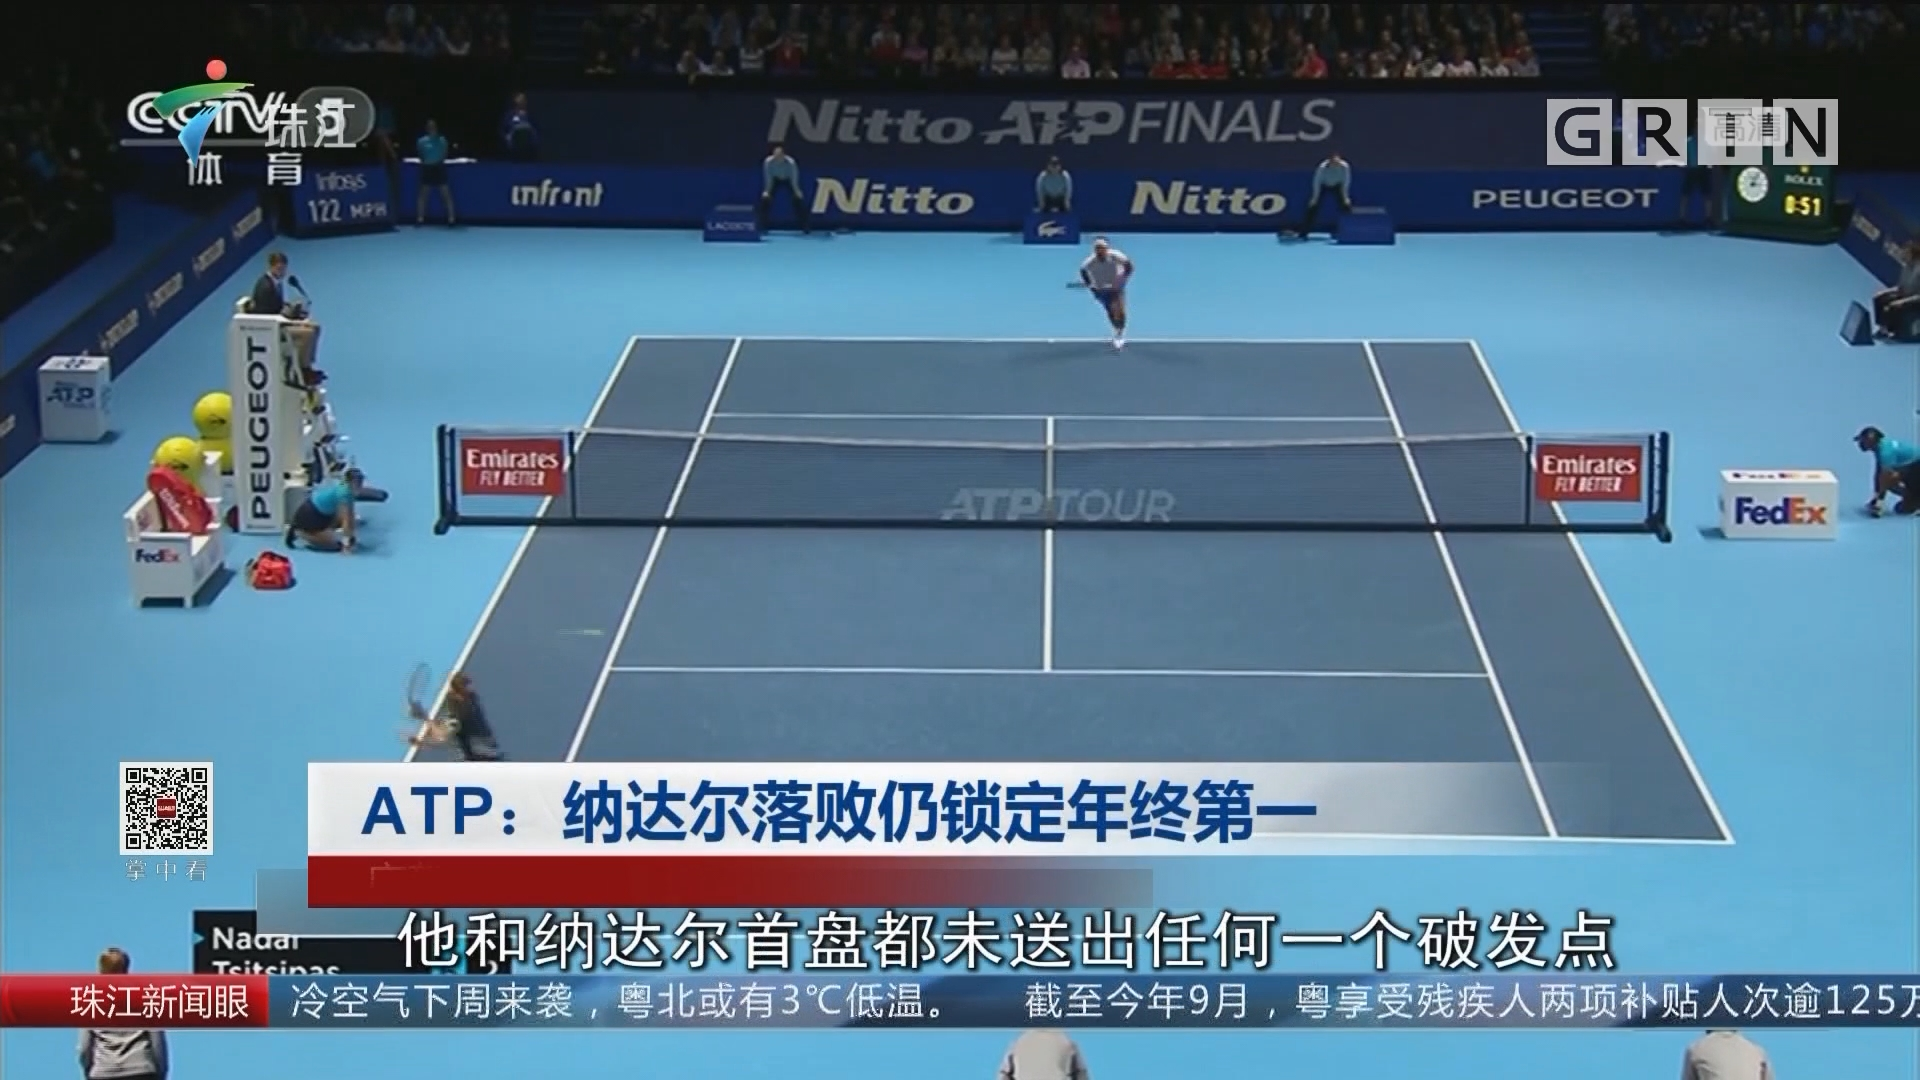 ATP:纳达尔落败仍锁定年终第一